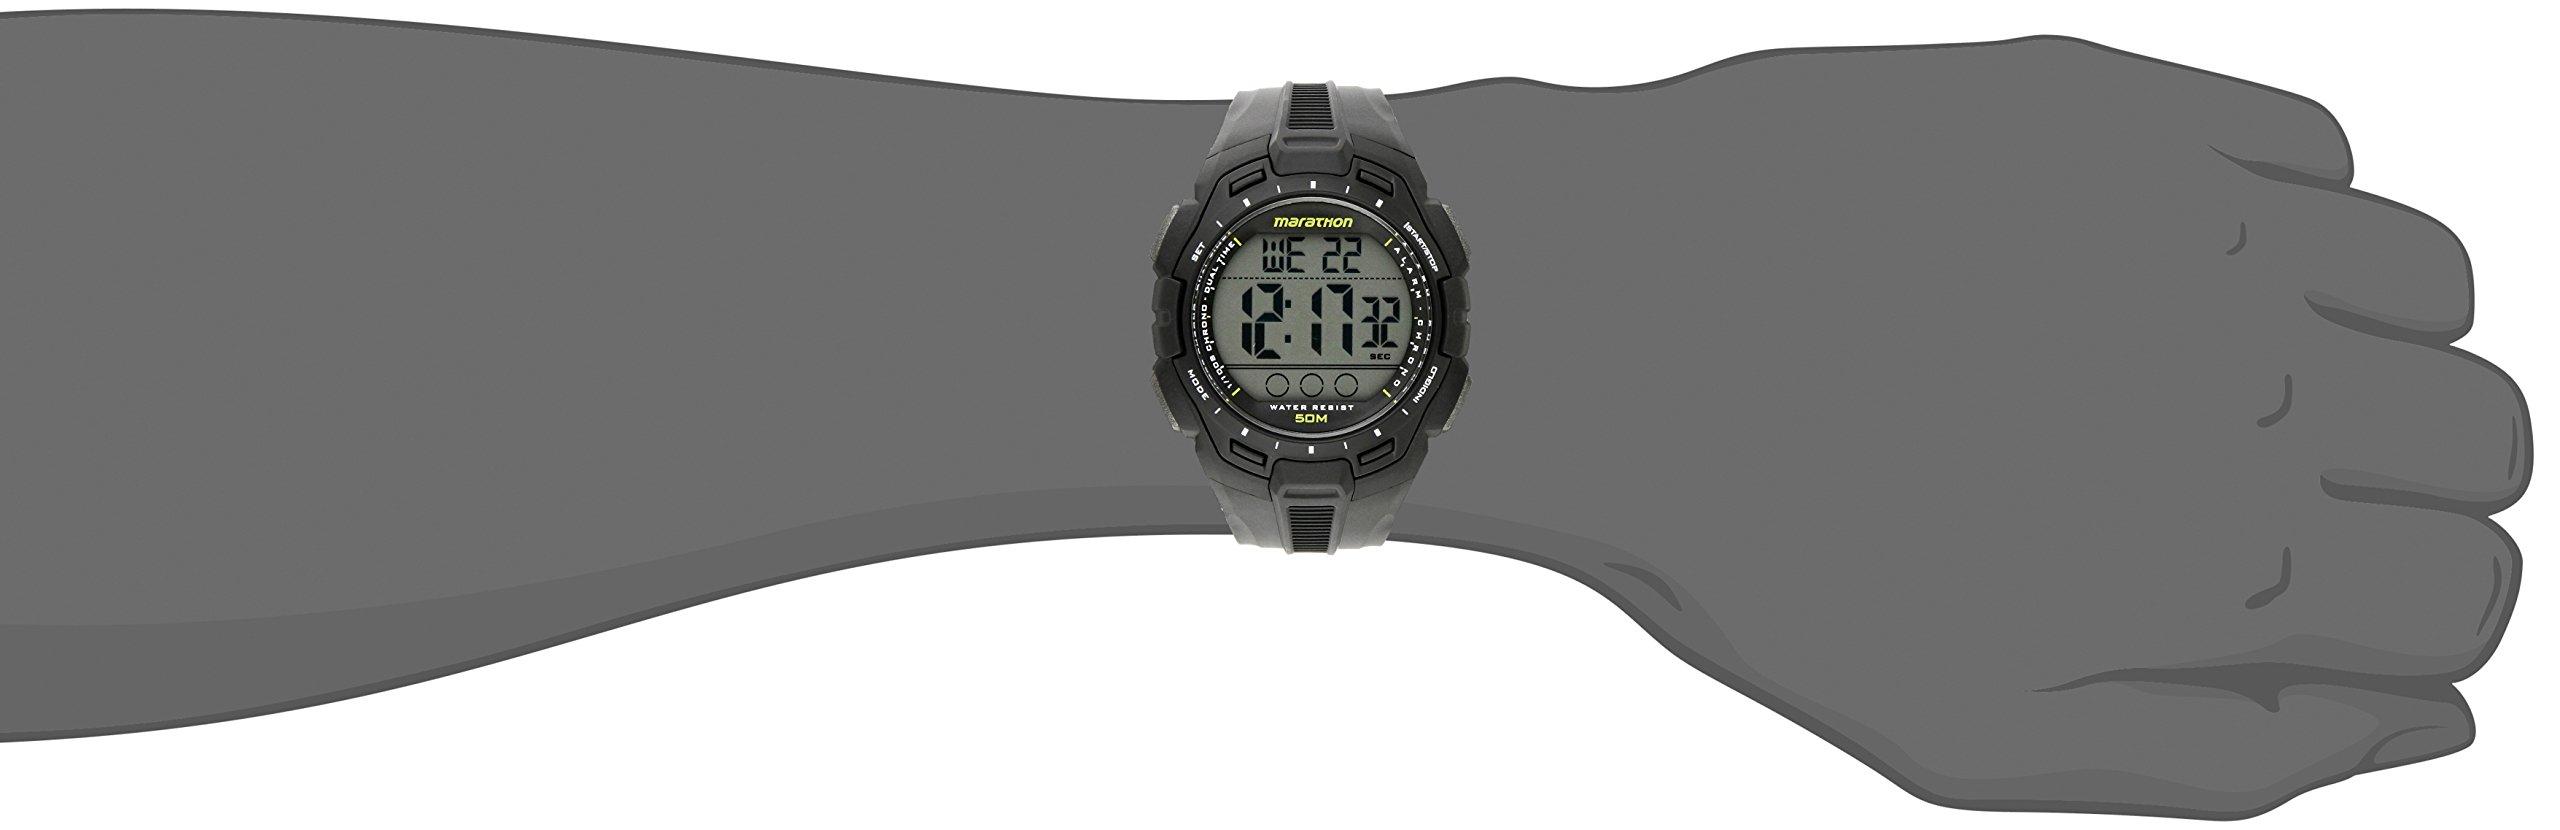 252b49230 Marathon by Timex Men s TW5K94800 Digital Full-Size Black Resin Strap Watch  - TW5K94800   Wrist Watches   Clothing